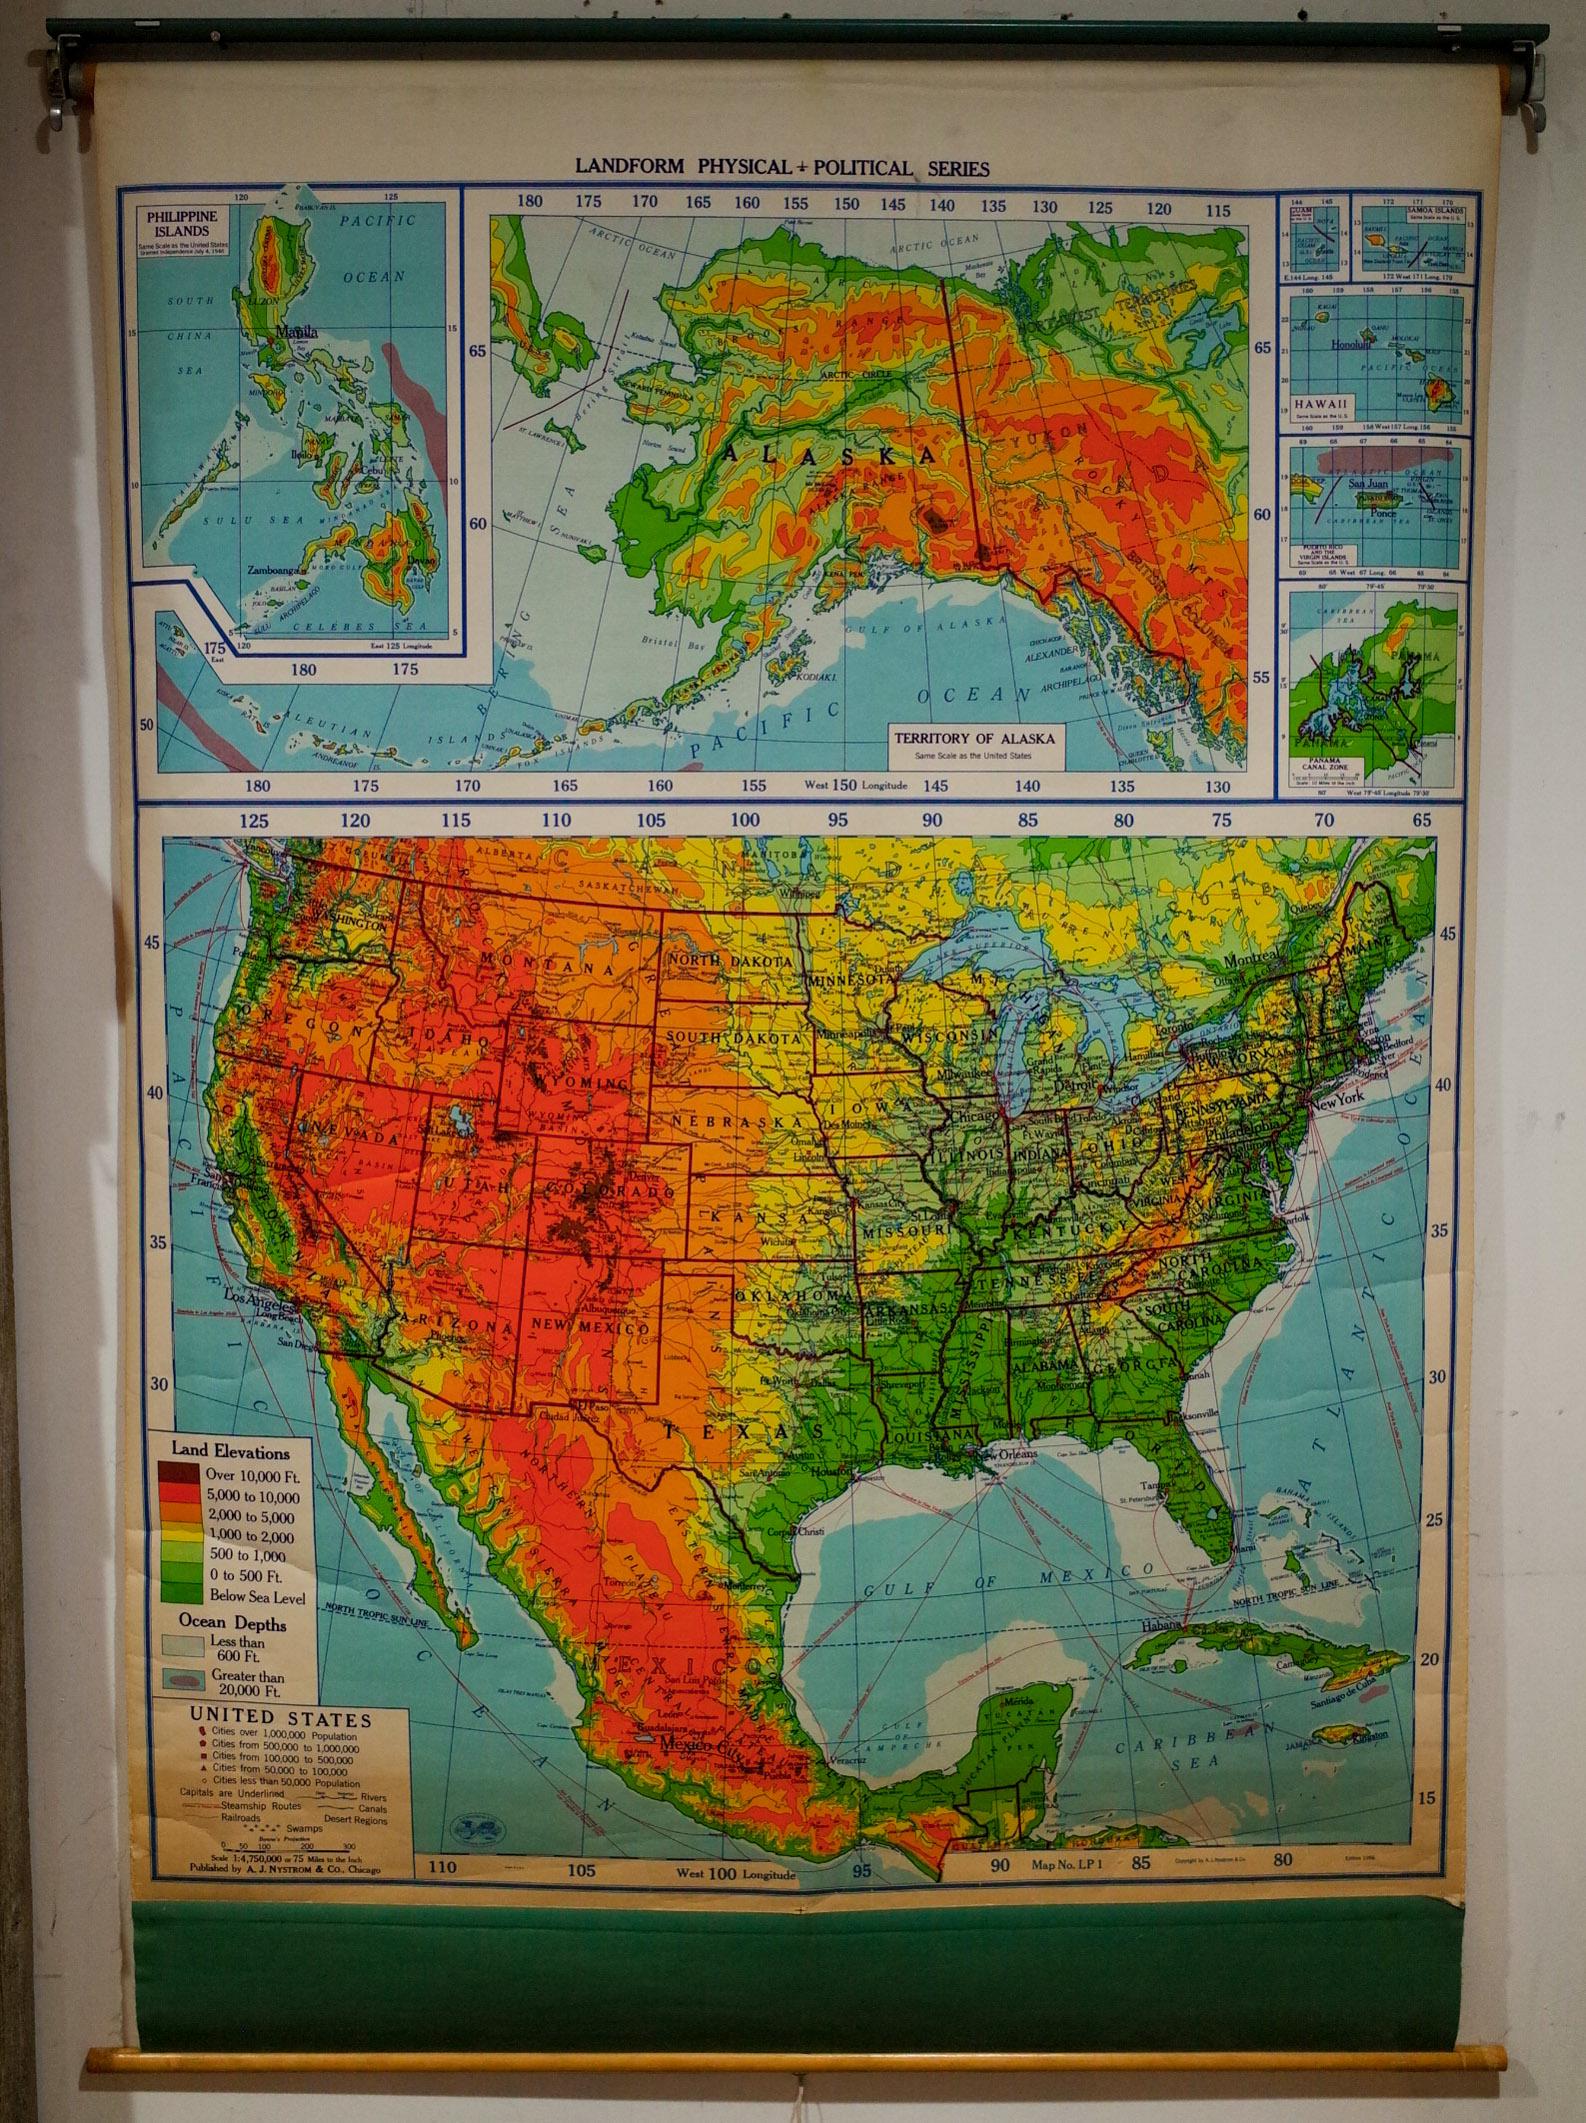 united-states-of-america-map.jpg